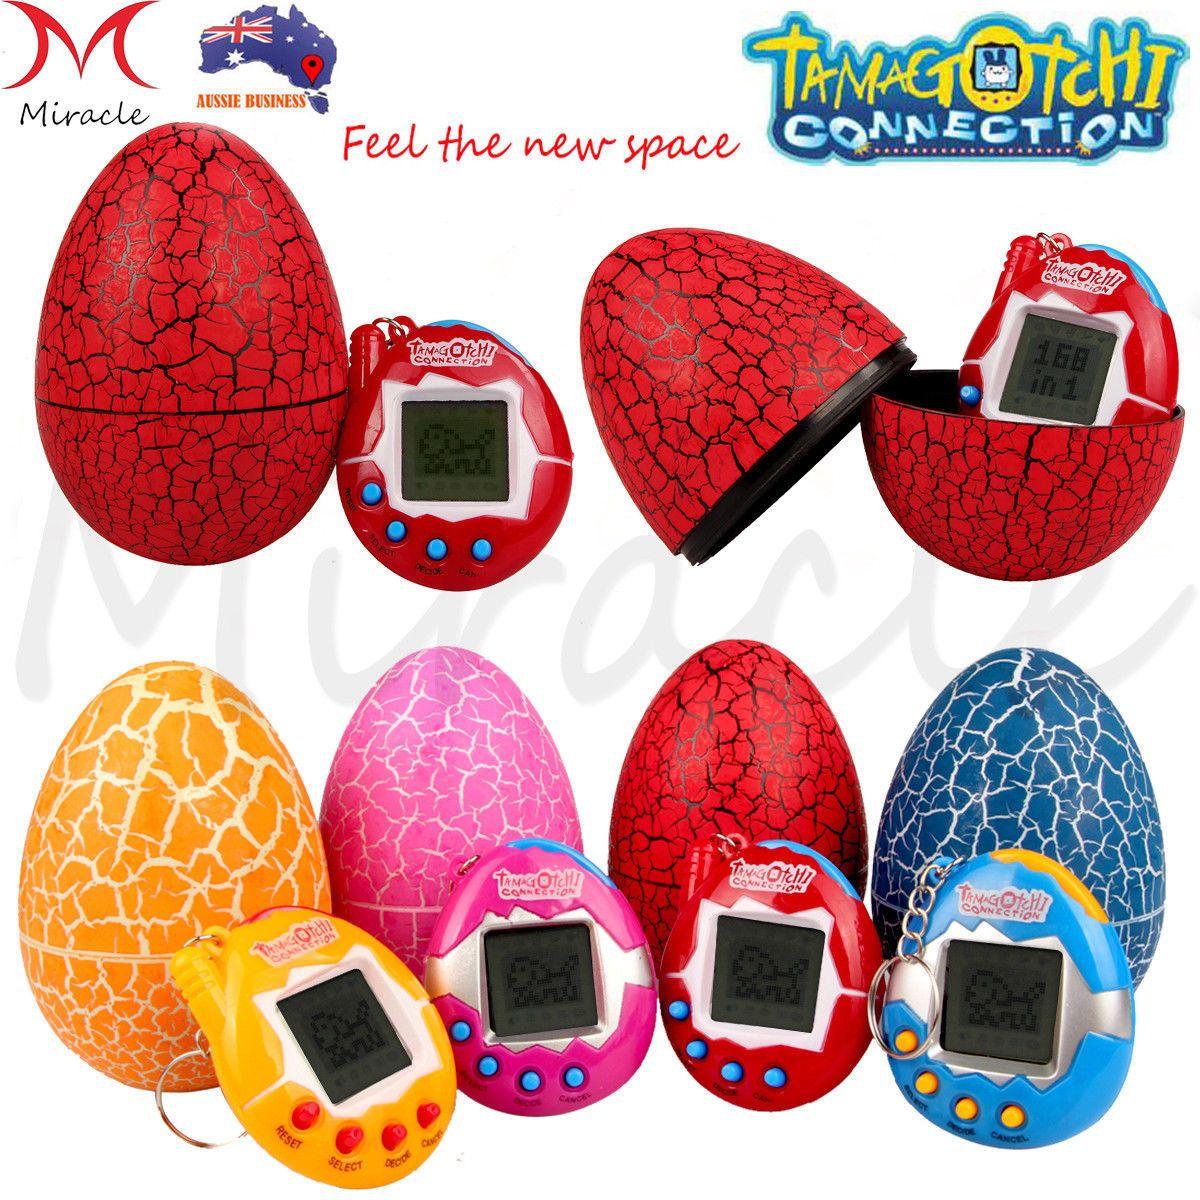 90S Tamagotchi Electronic Pets Toys Dinosaur Egg Kids Gift